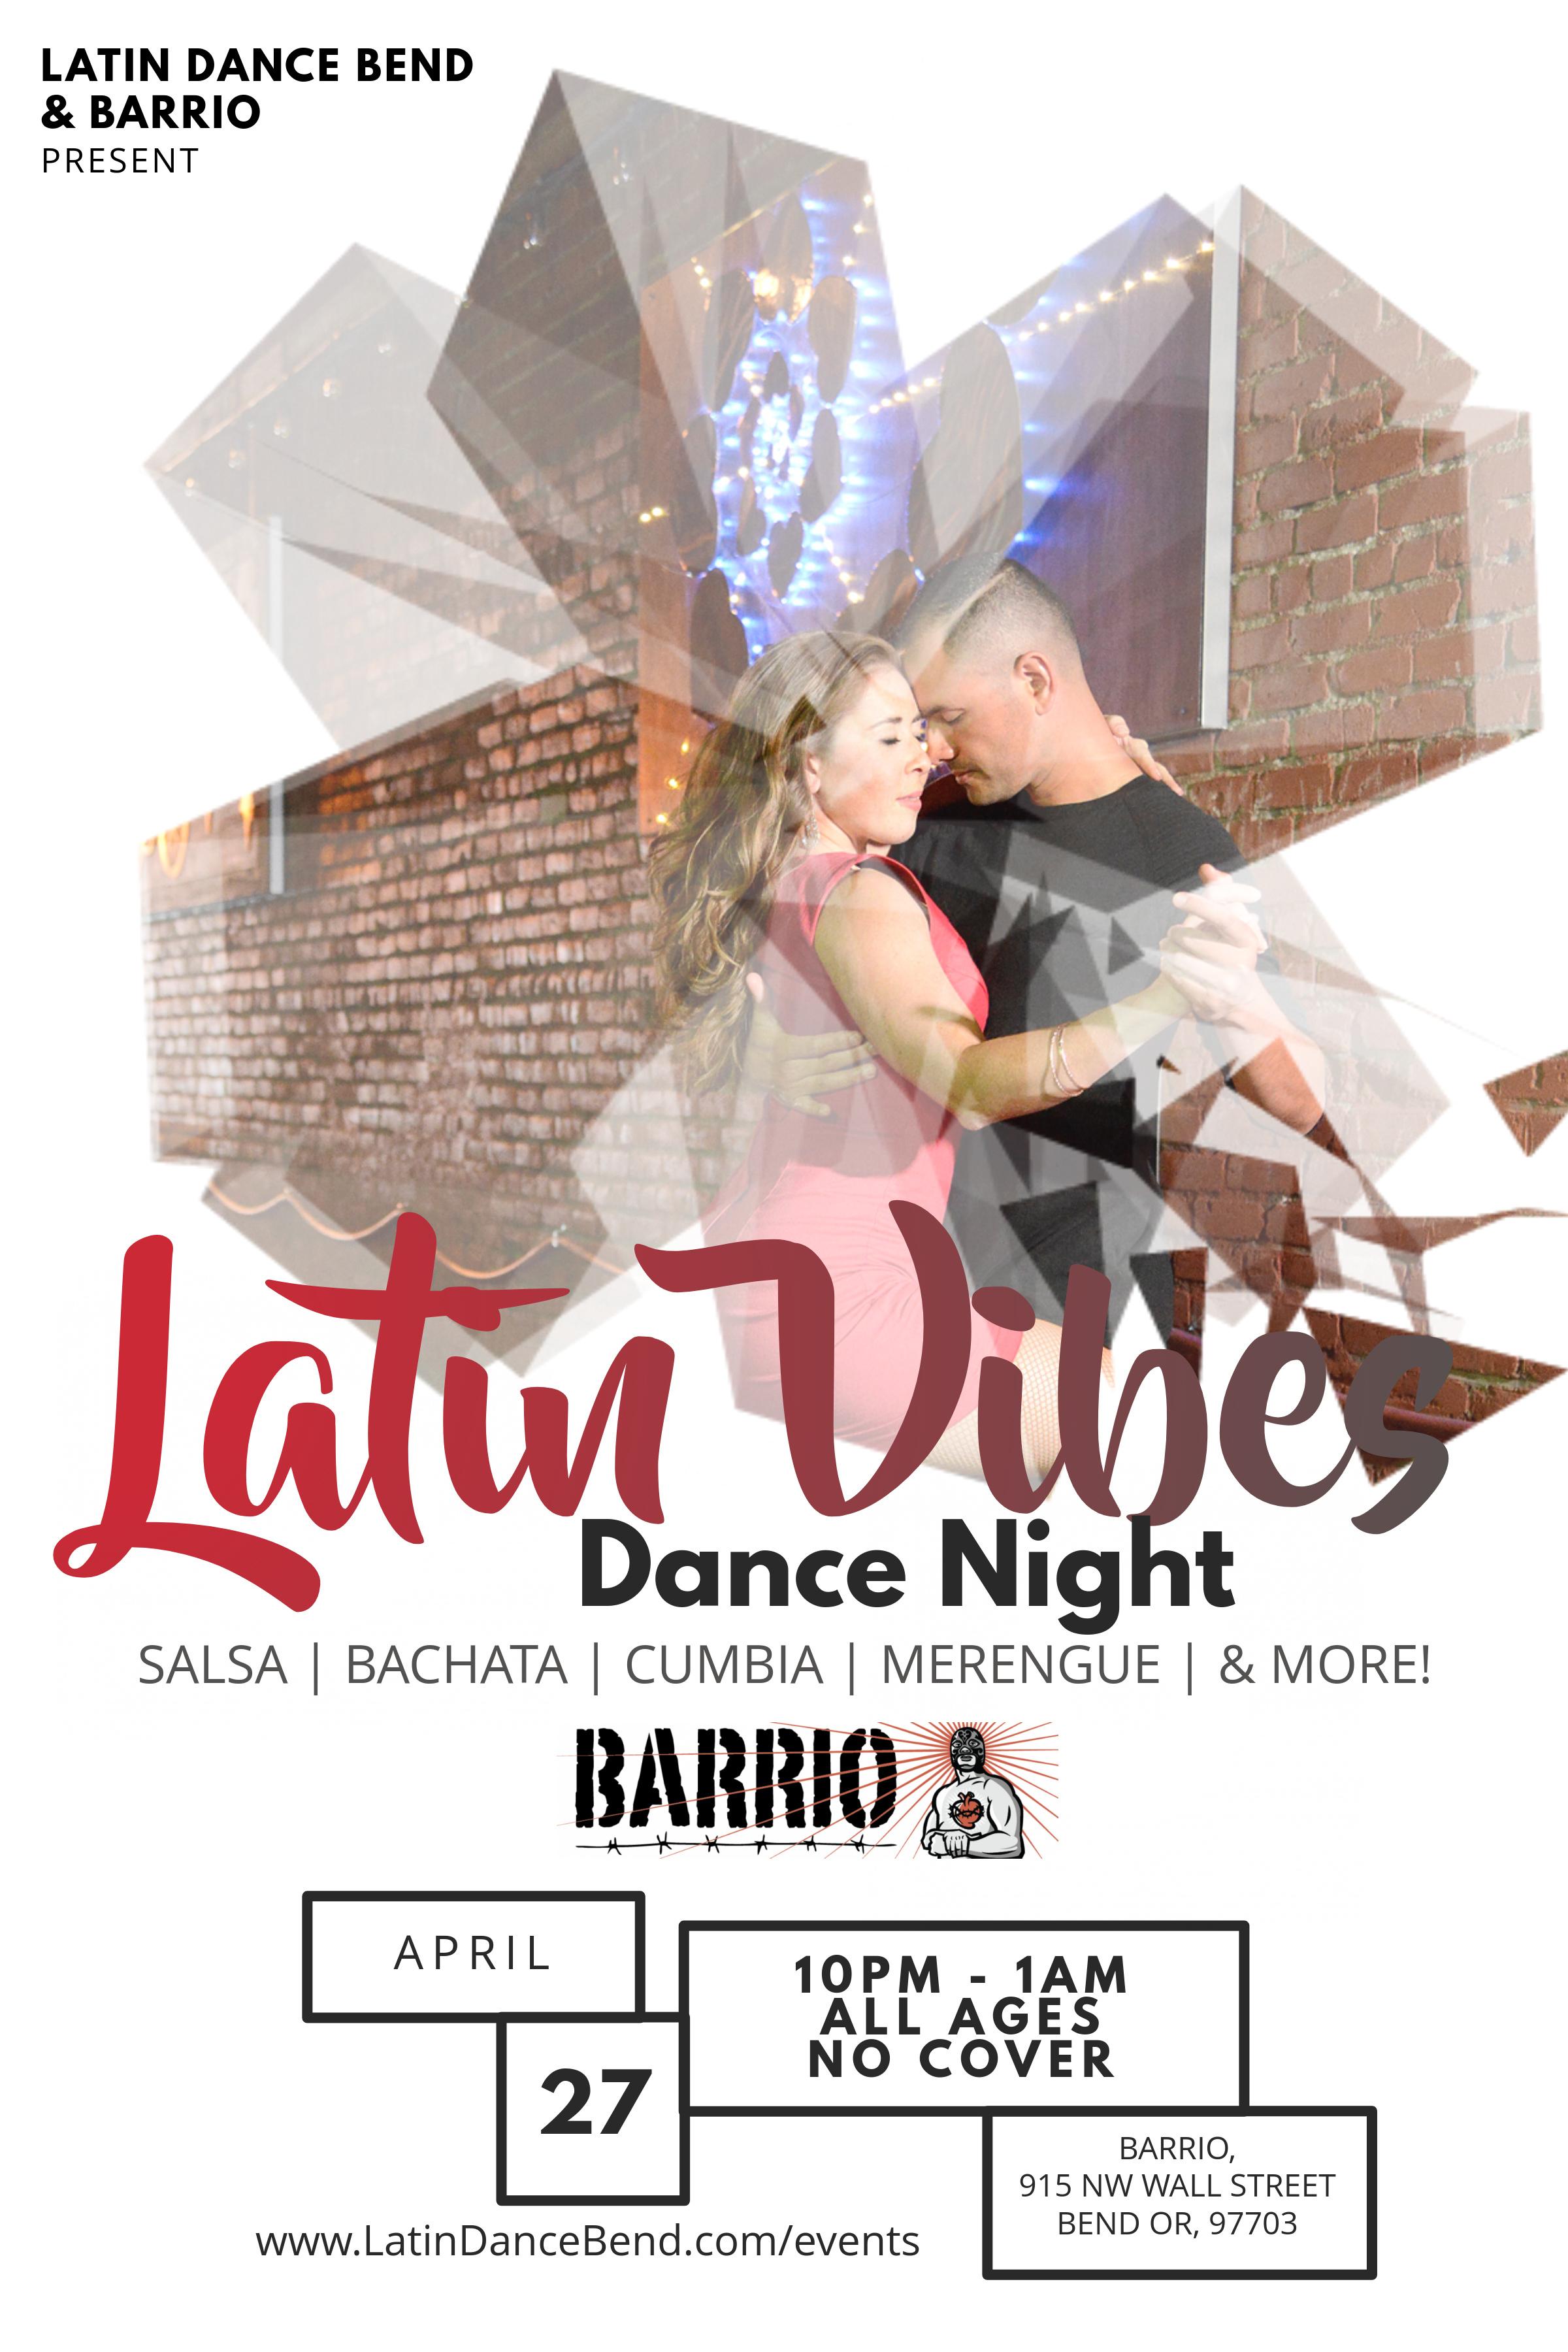 LatinVibes-April-Barrio.jpg